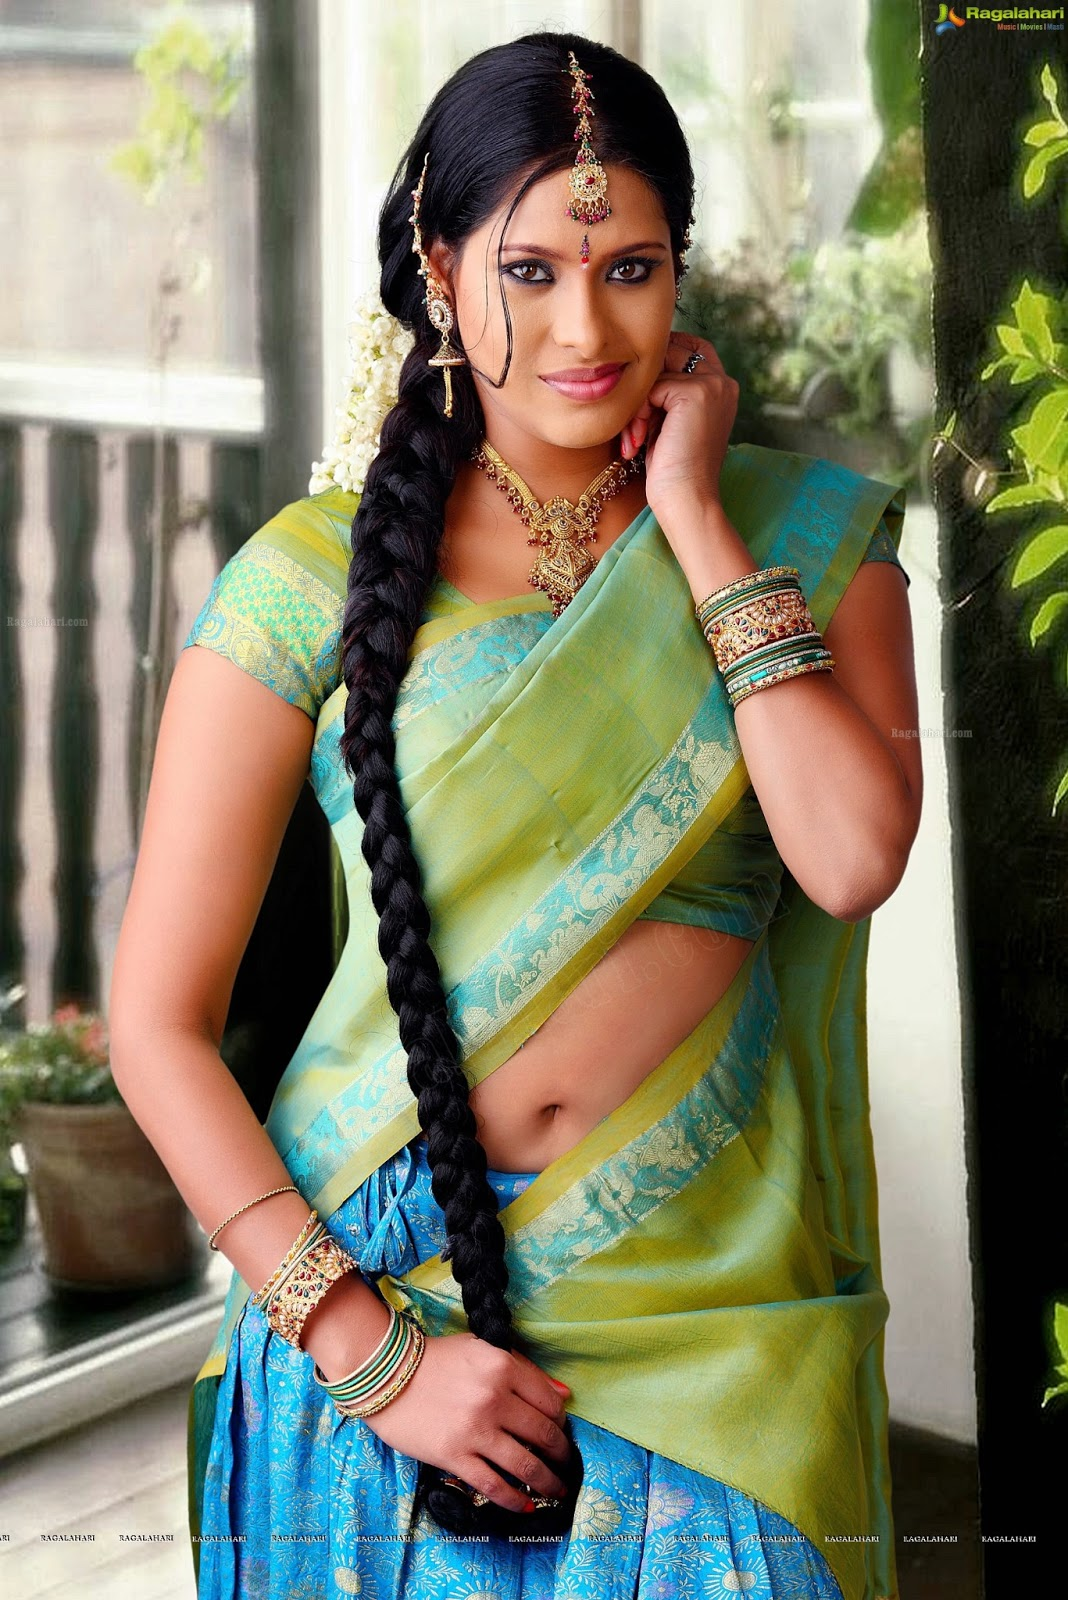 Gemini TV Indrani serial actress ARCHANA